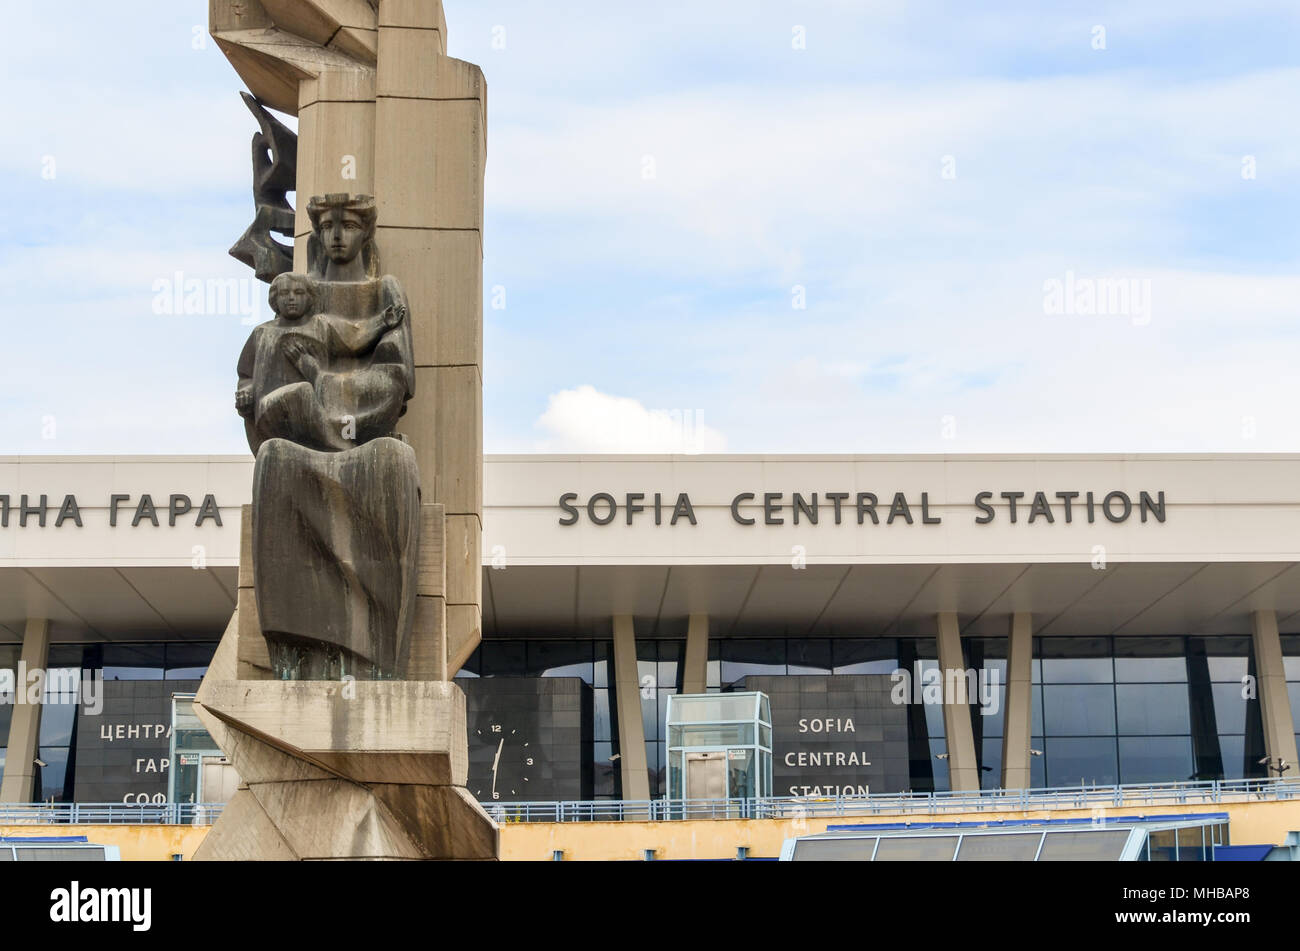 Sofia Central Station and Bulgarian State Railways (BDZ) in Sofia, Bulgaria - Stock Image